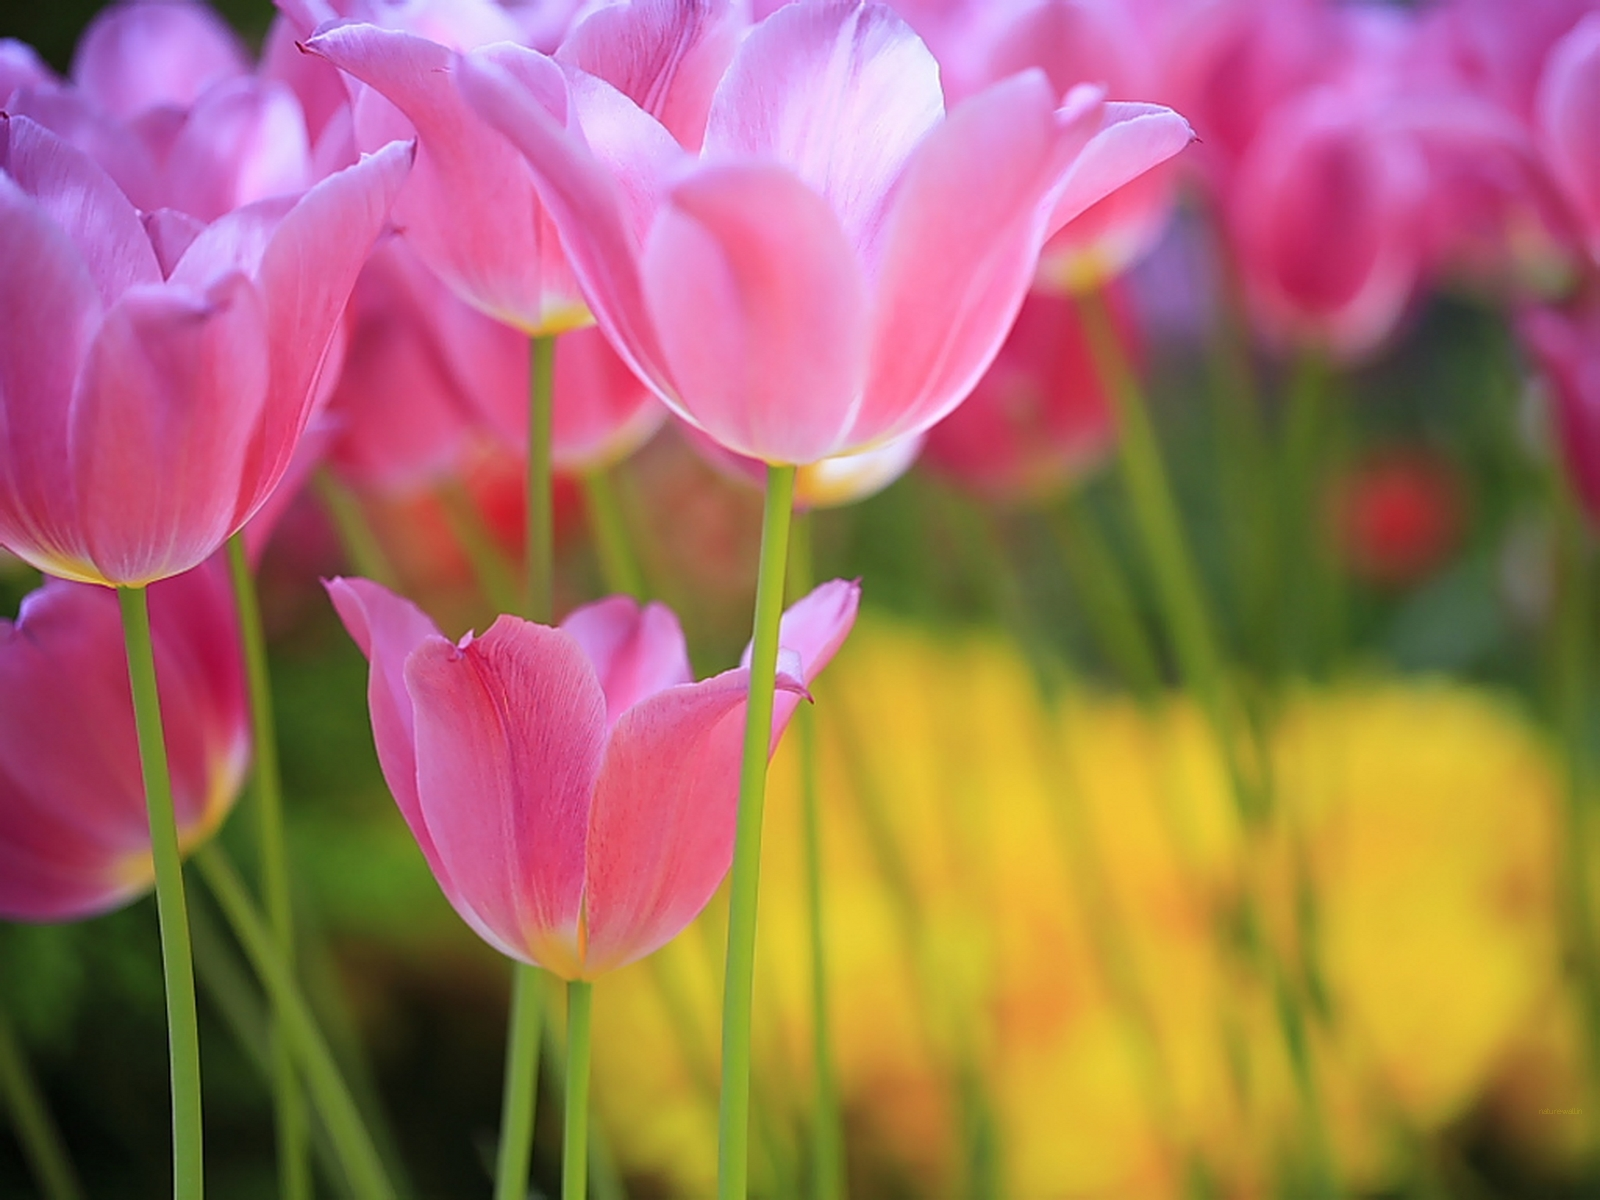 http://4.bp.blogspot.com/-aGEeJlEC75A/T_-R91rzAVI/AAAAAAAAARE/es9TMc5lrfs/s1600/shiny-purple-tulips.jpg